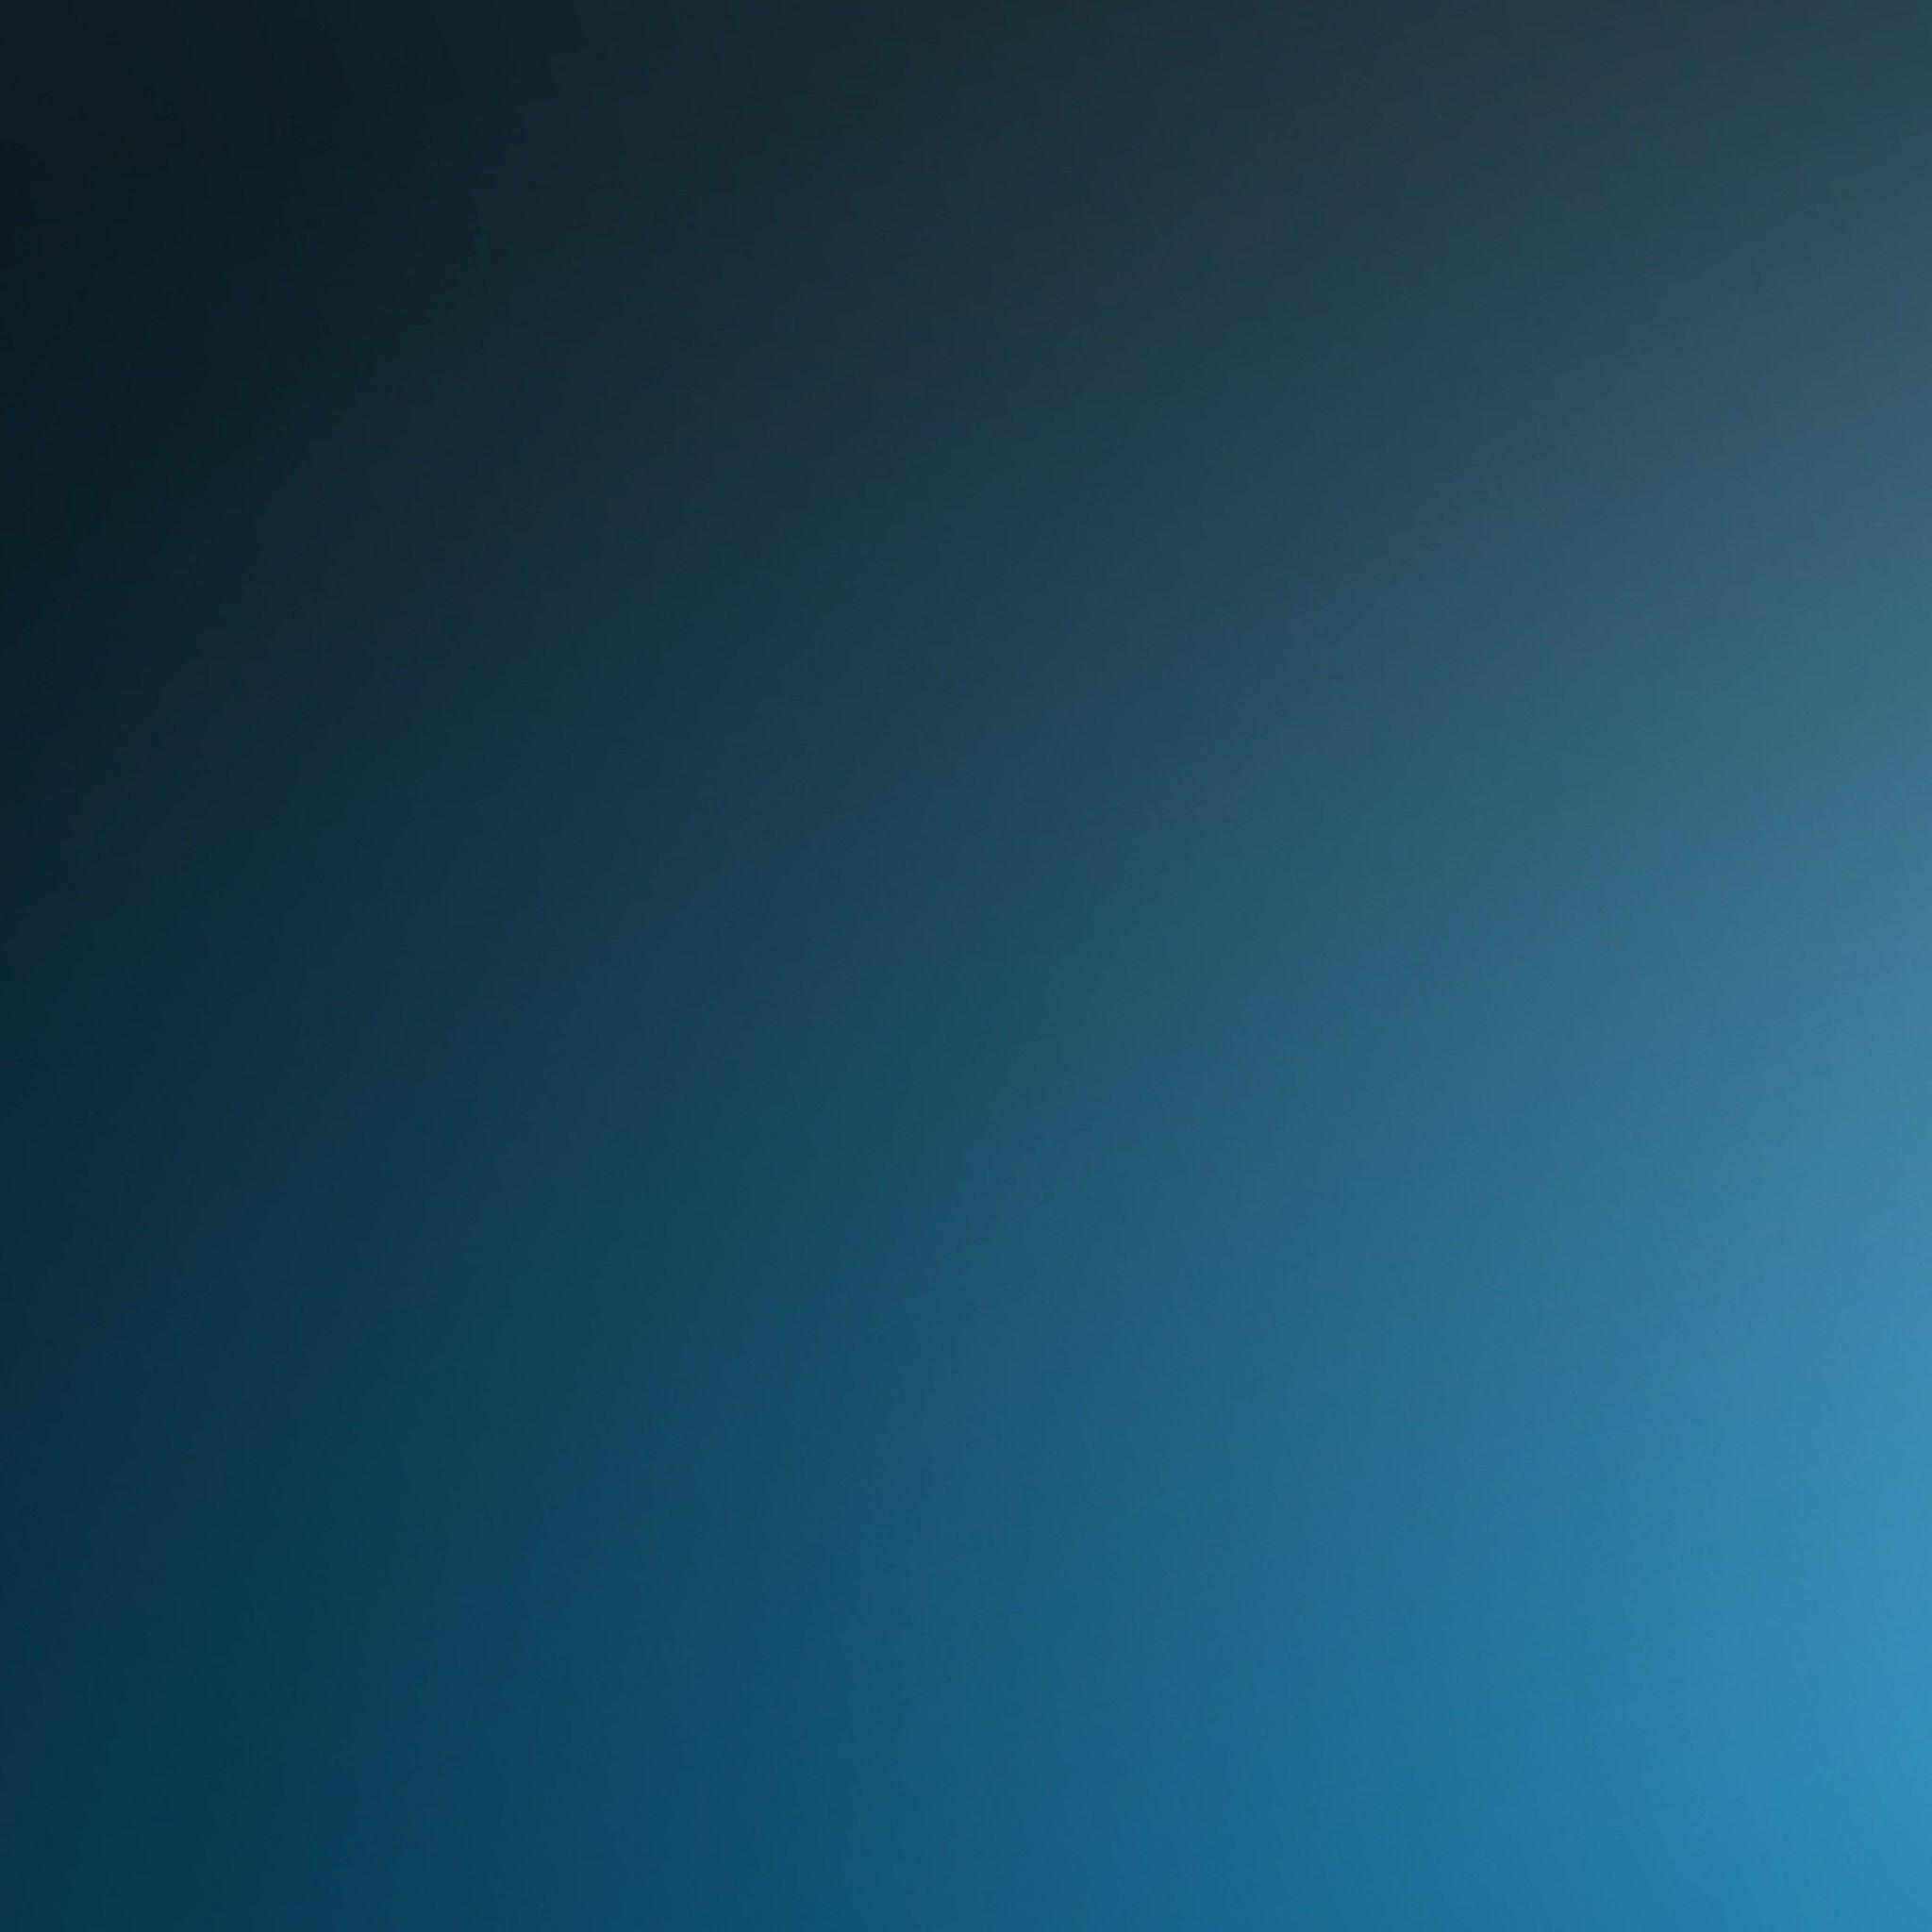 Iphone Sky Blue Colour Wallpaper Hd